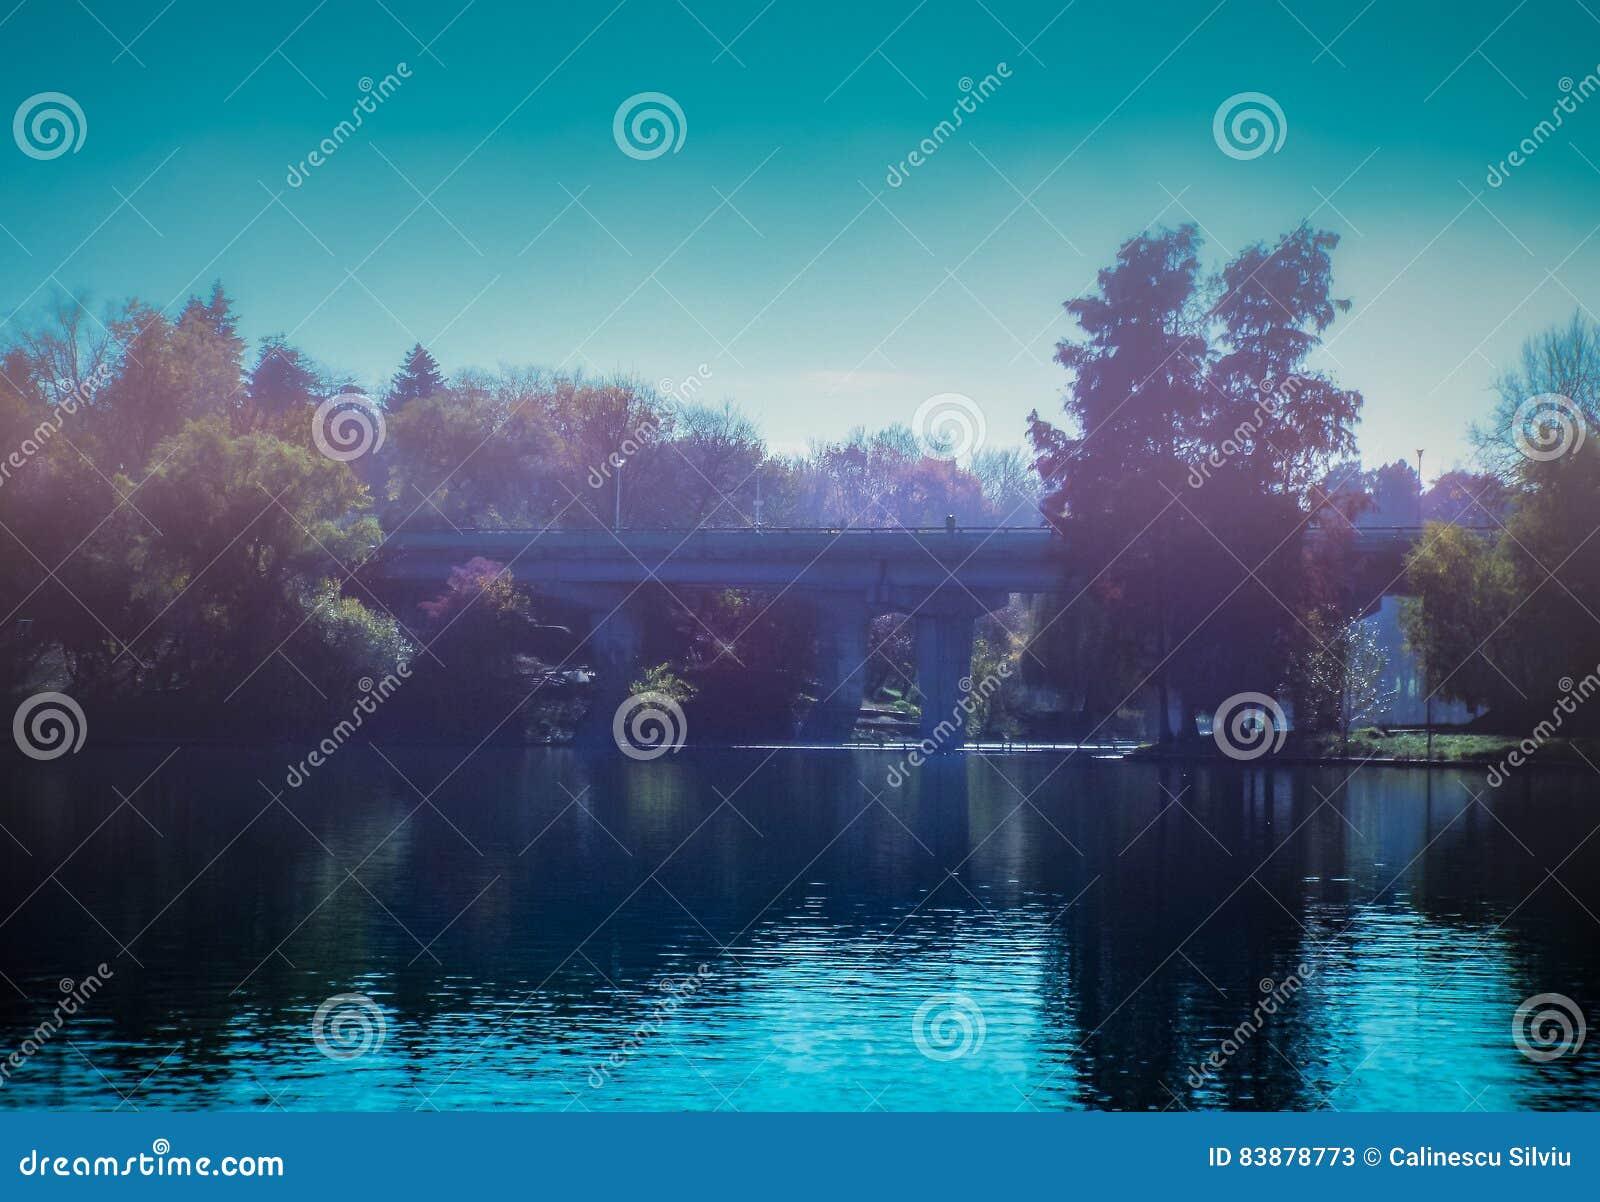 Artistivc το μπλε ομιχλώδες πρωί φθινοπώρου στη λίμνη